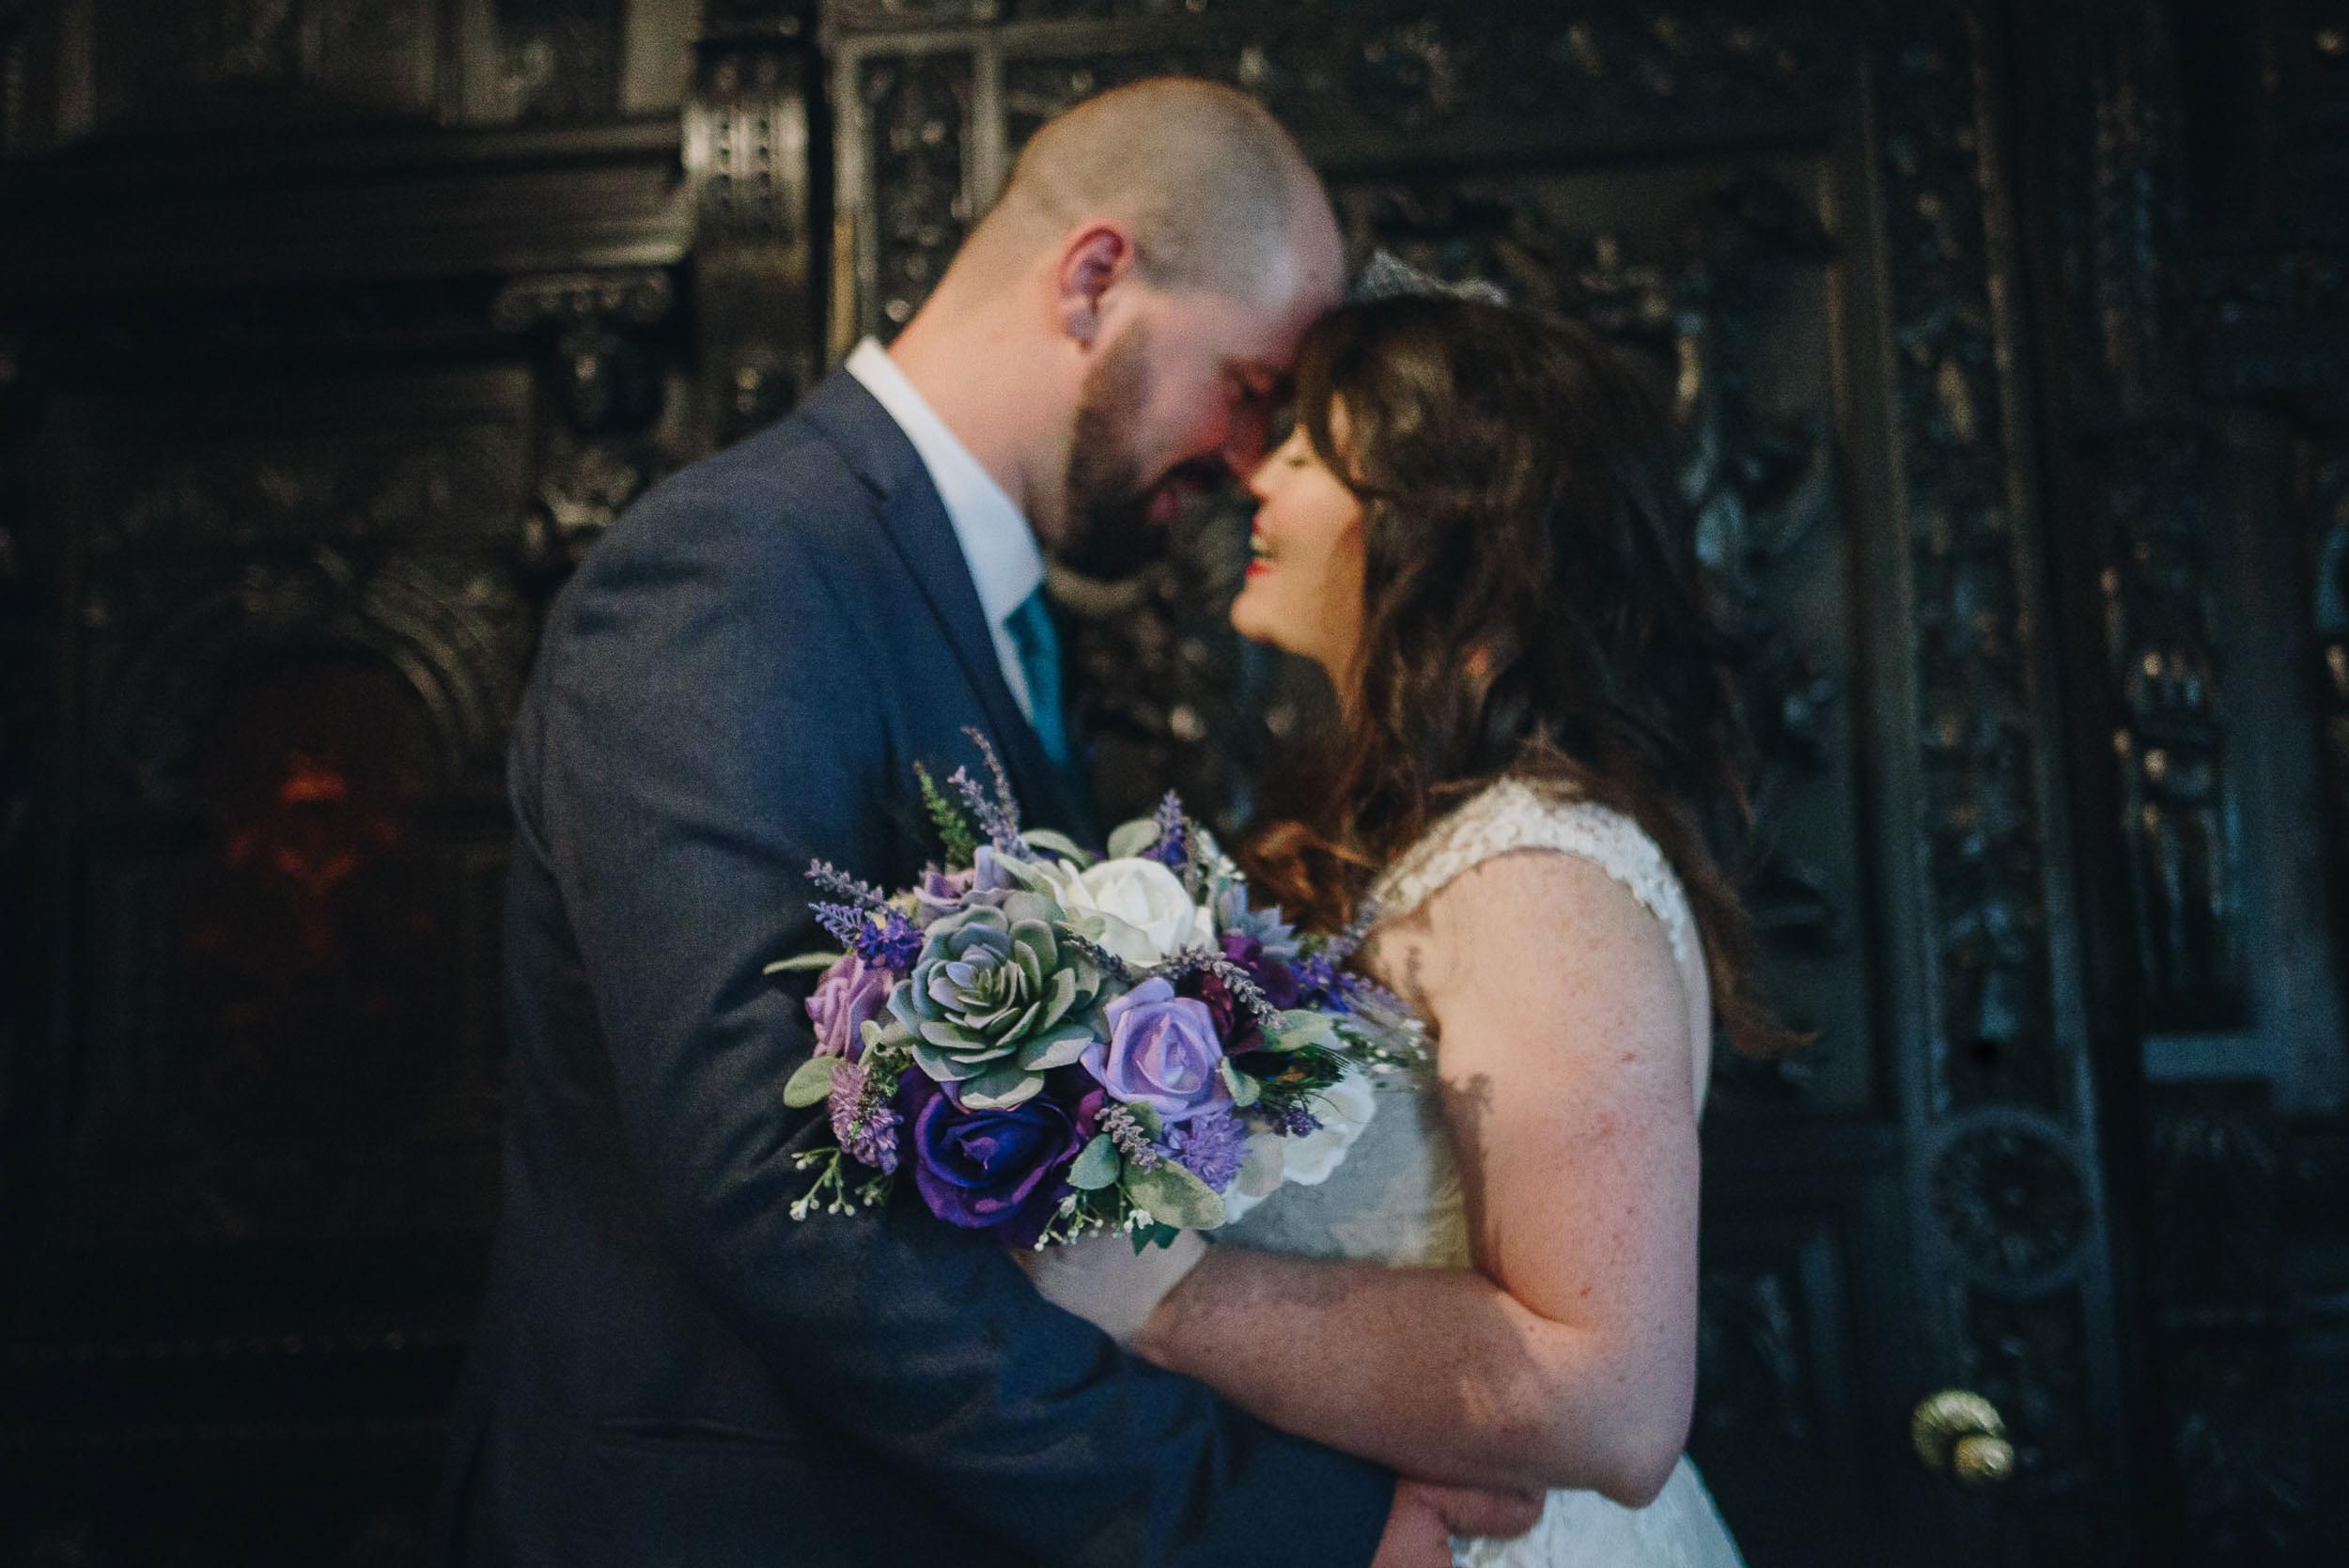 Smithills-hall-wedding-manchester-the-barlow-edgworth-hadfield-50.jpg